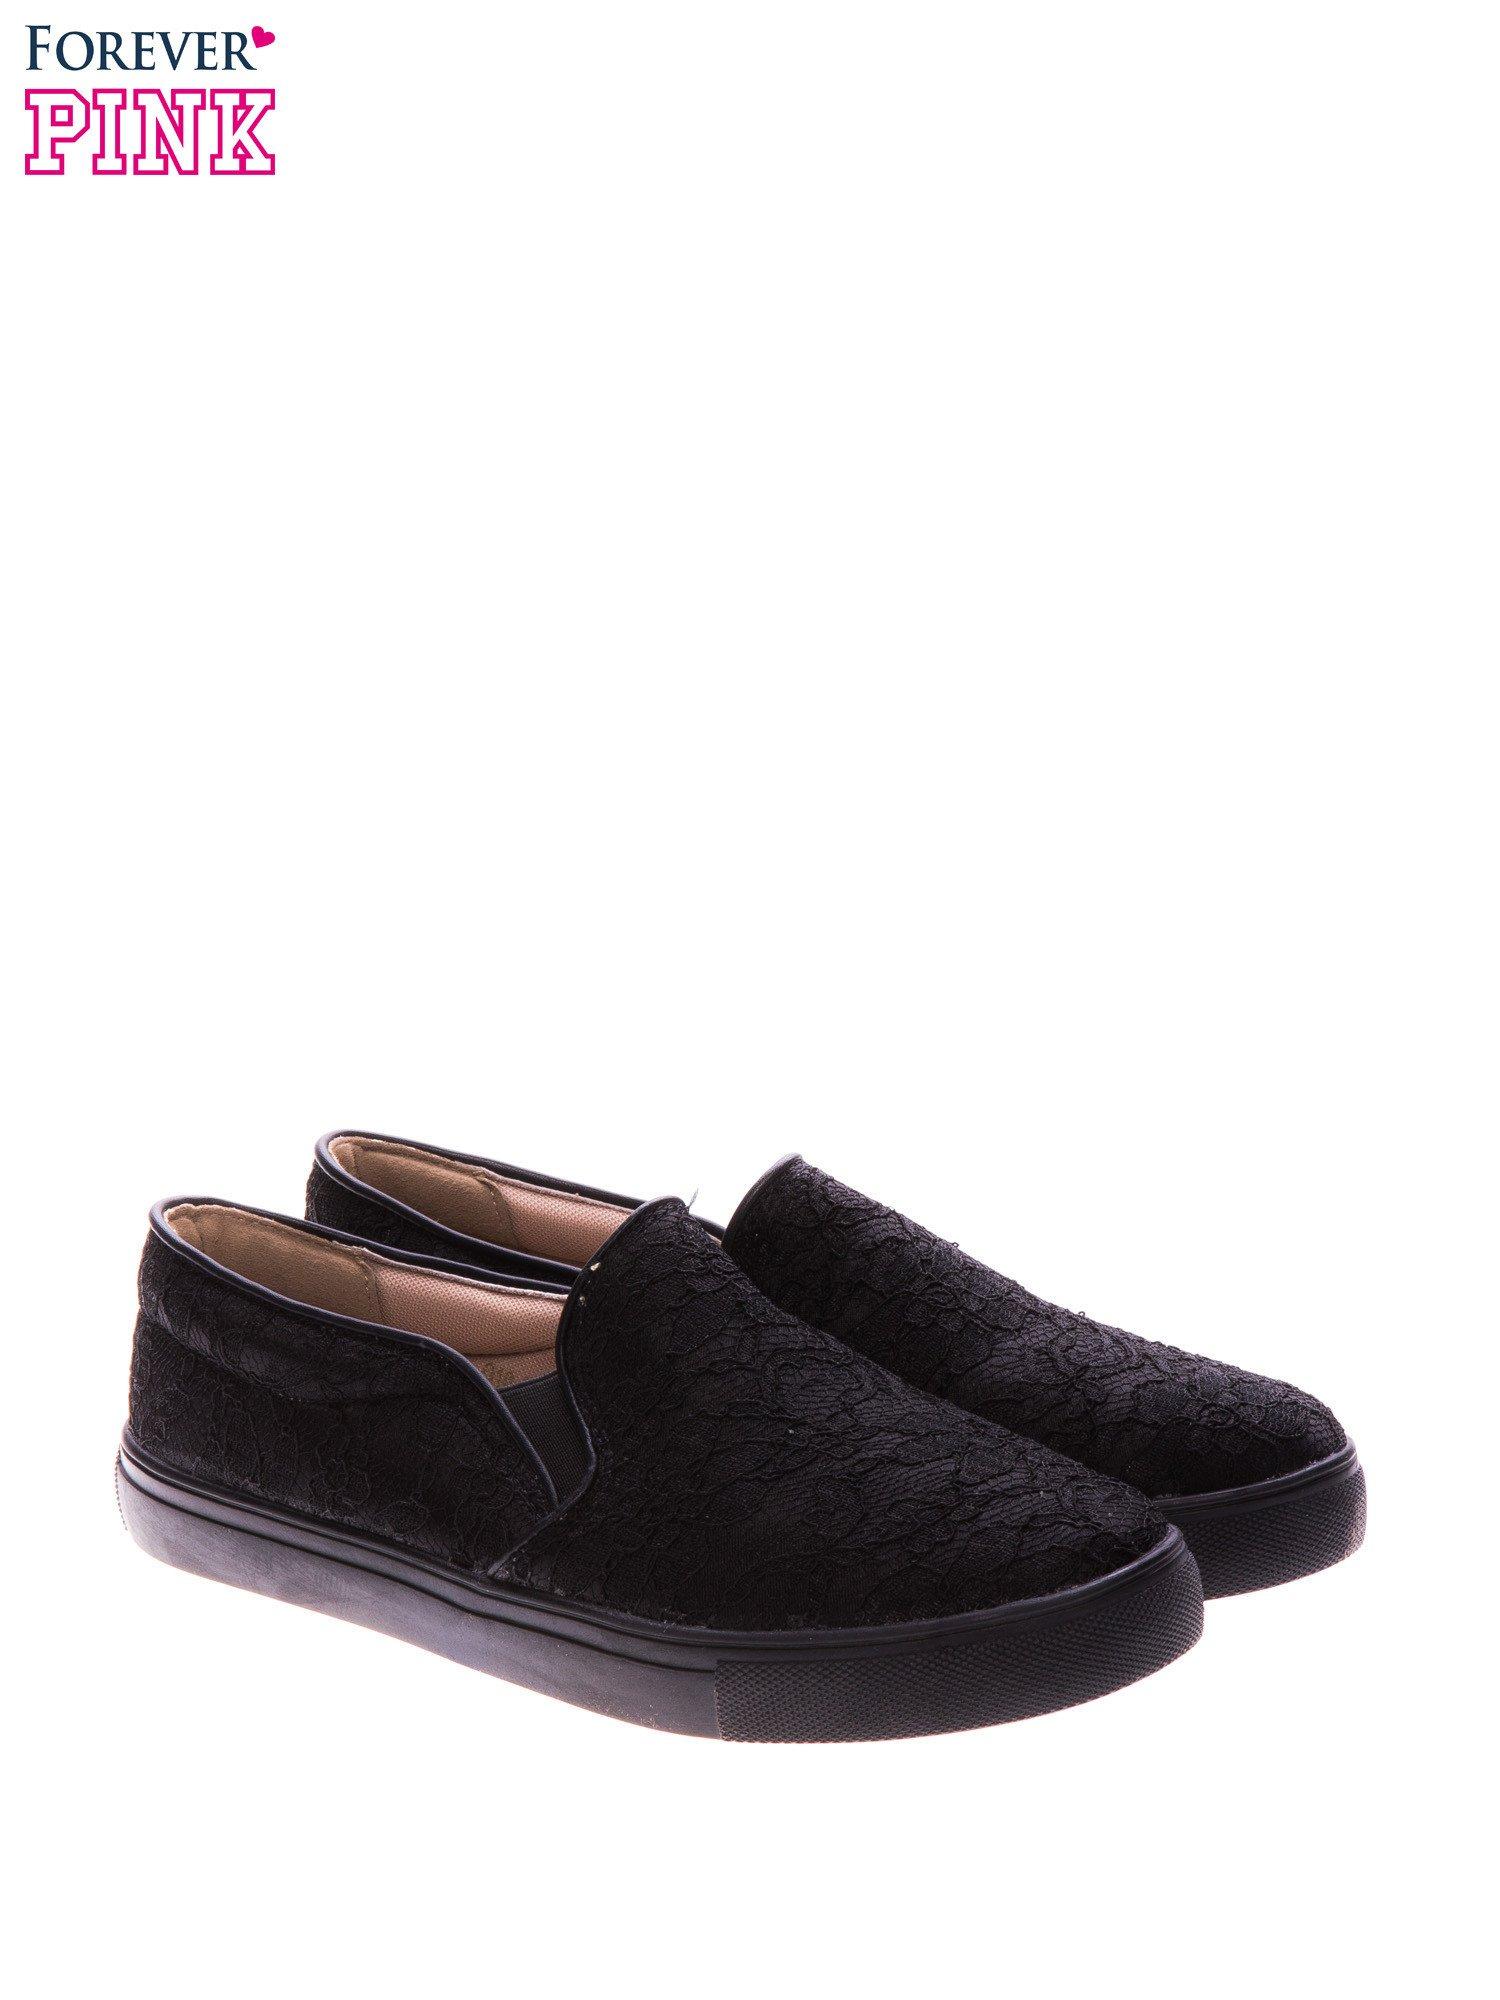 Czarne koronkowe buty slip on                                  zdj.                                  2